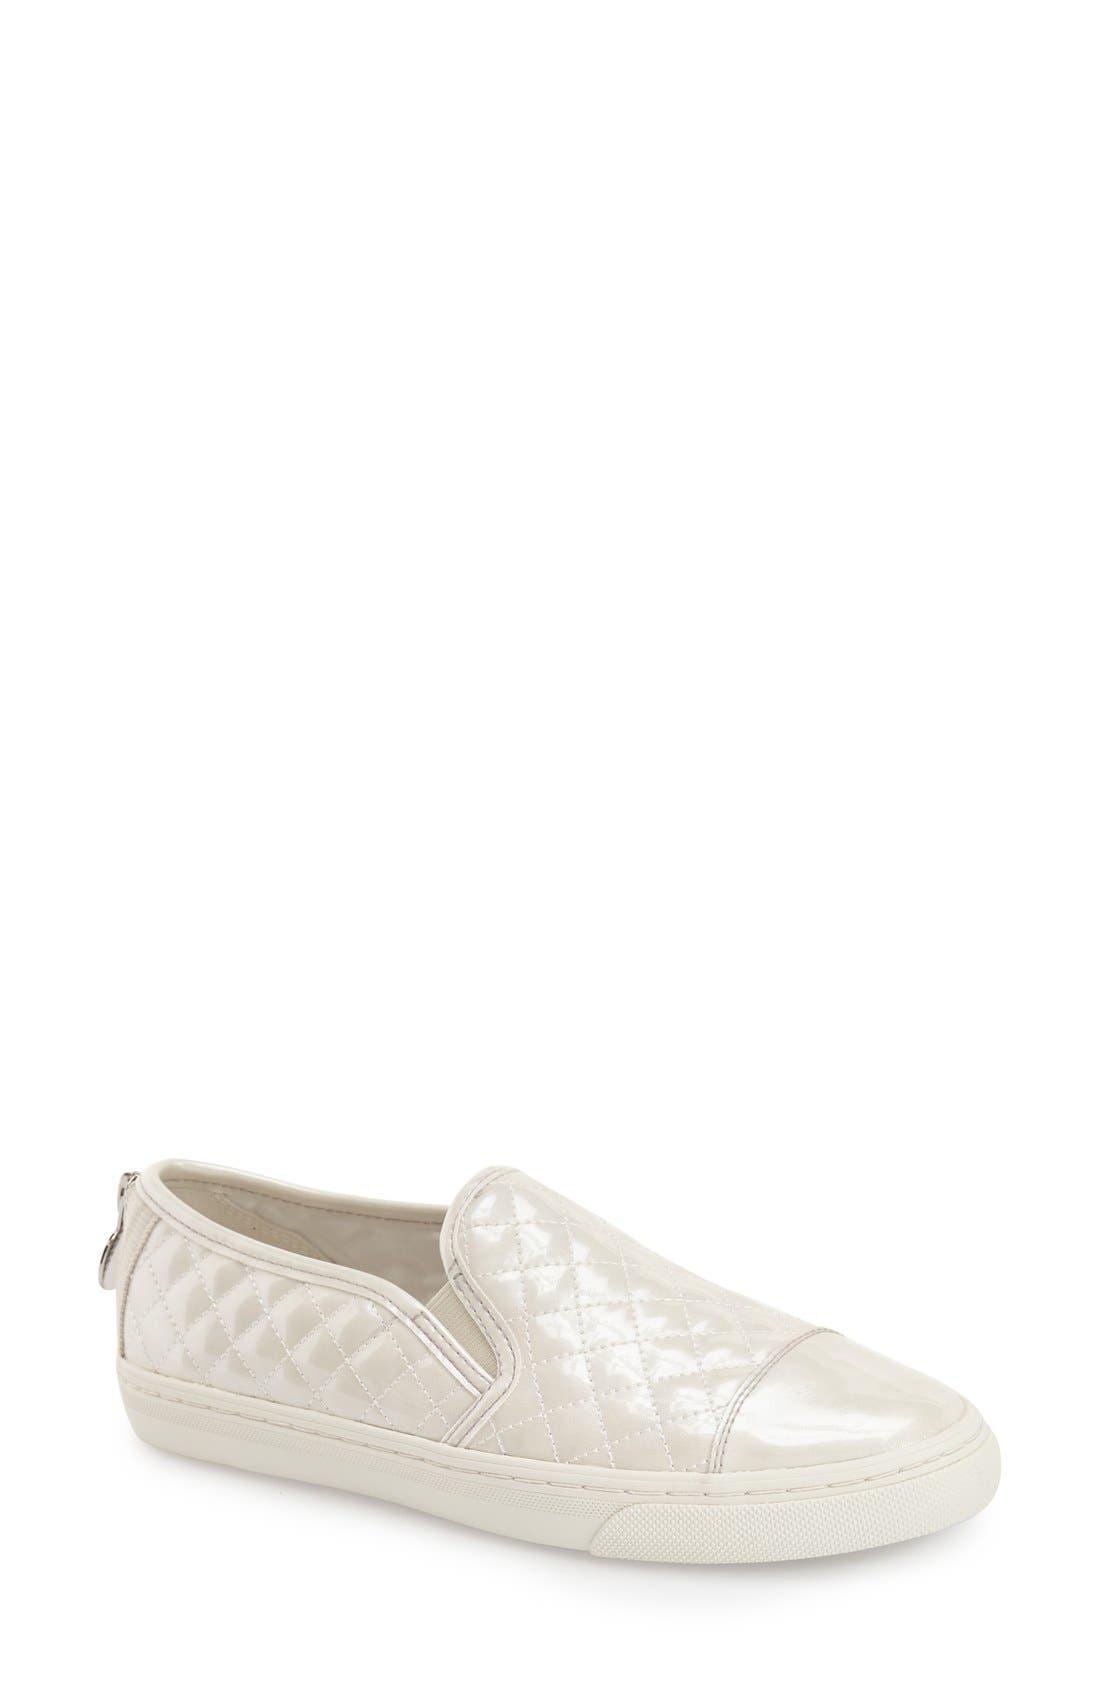 Main Image - Geox 'New Club' Slip-On Sneaker (Women)